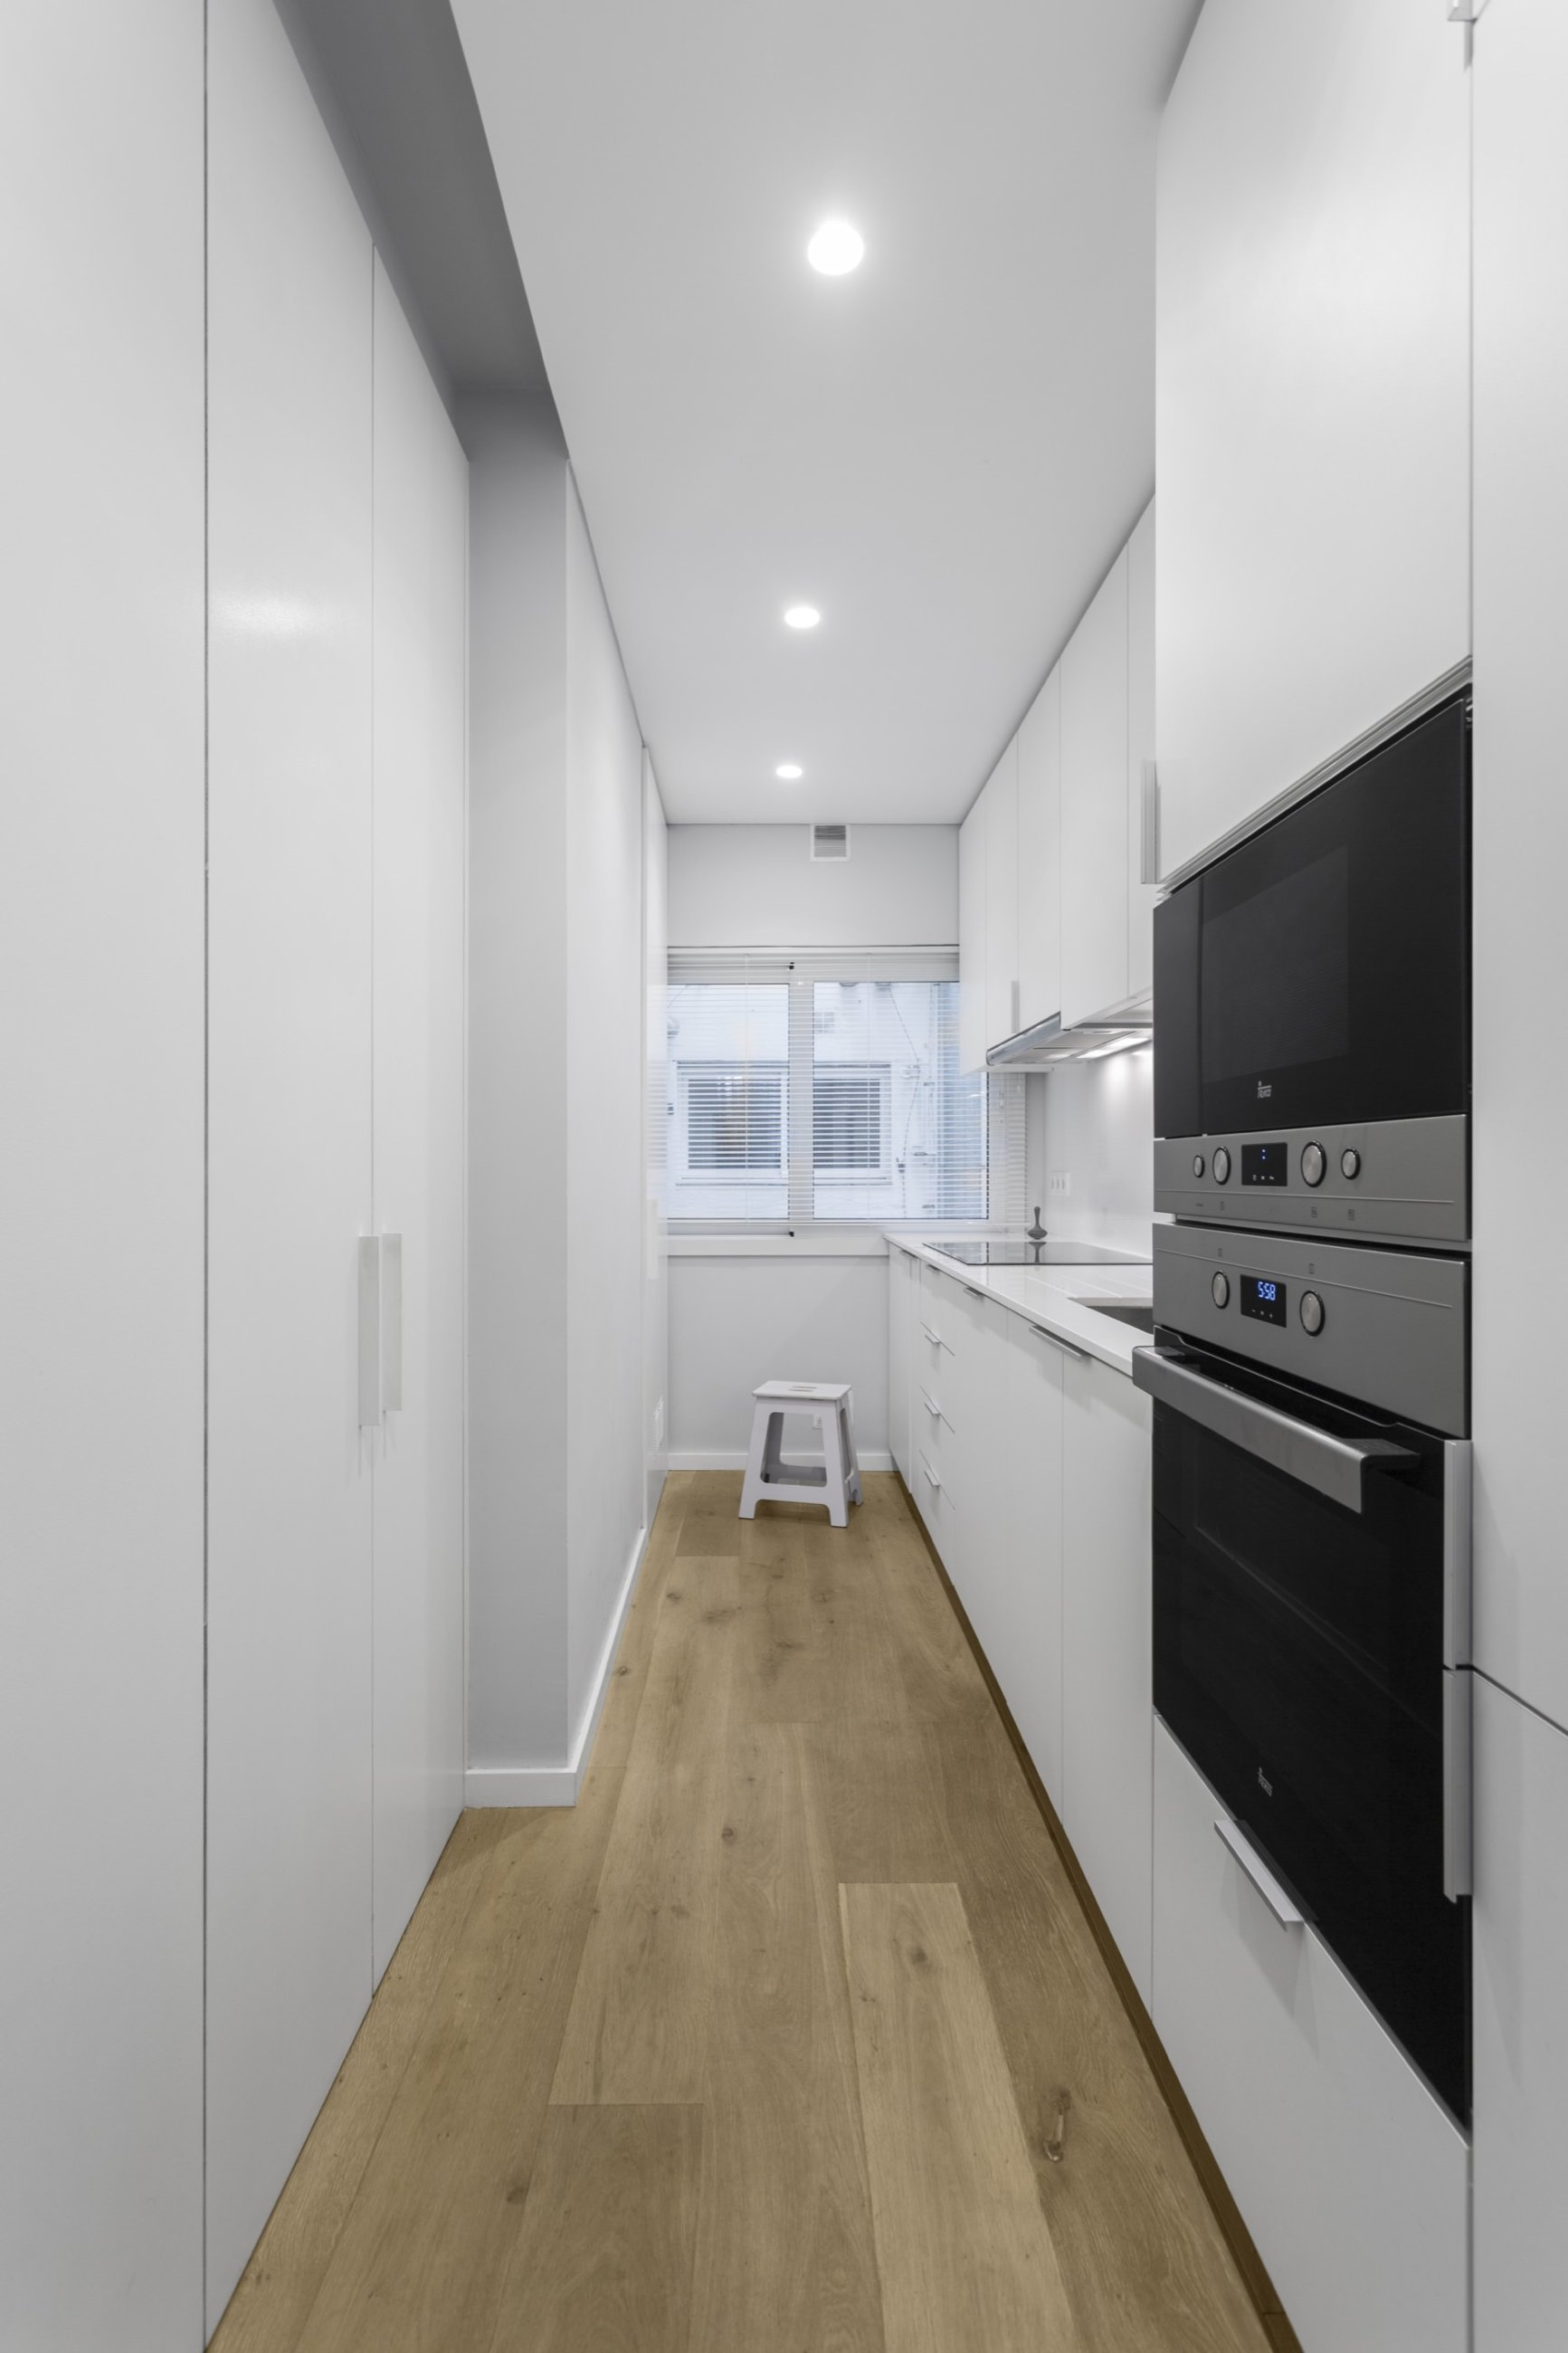 Apartamento Barcelona Arquitecto Paulo Martins 27 do fotografo Ivo Tavares Studio